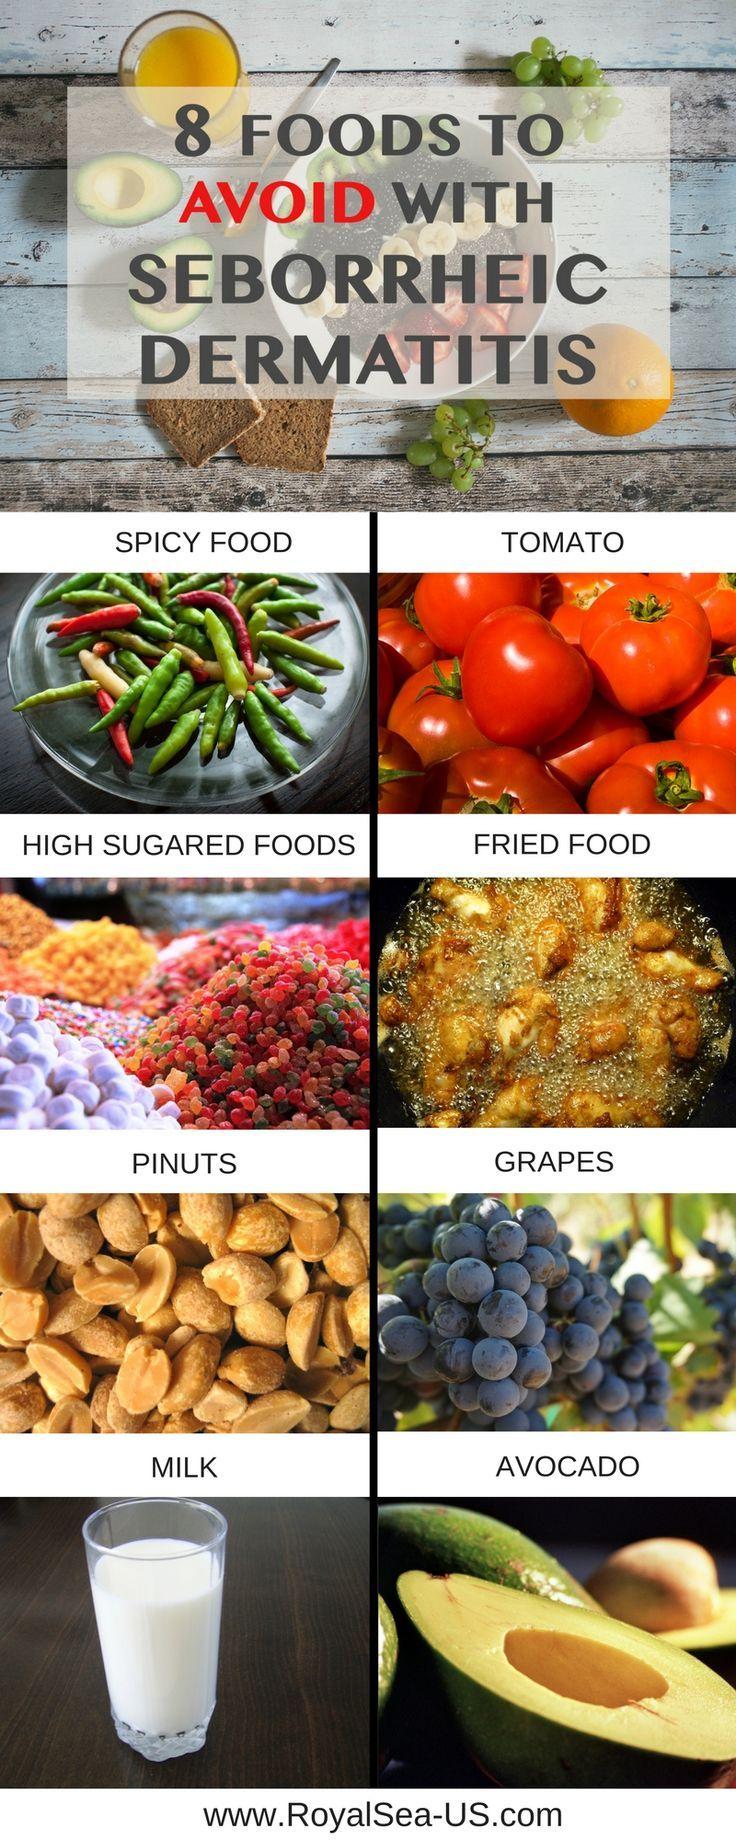 How to Treat Eczema with Diet How to Treat Eczema with Diet new foto